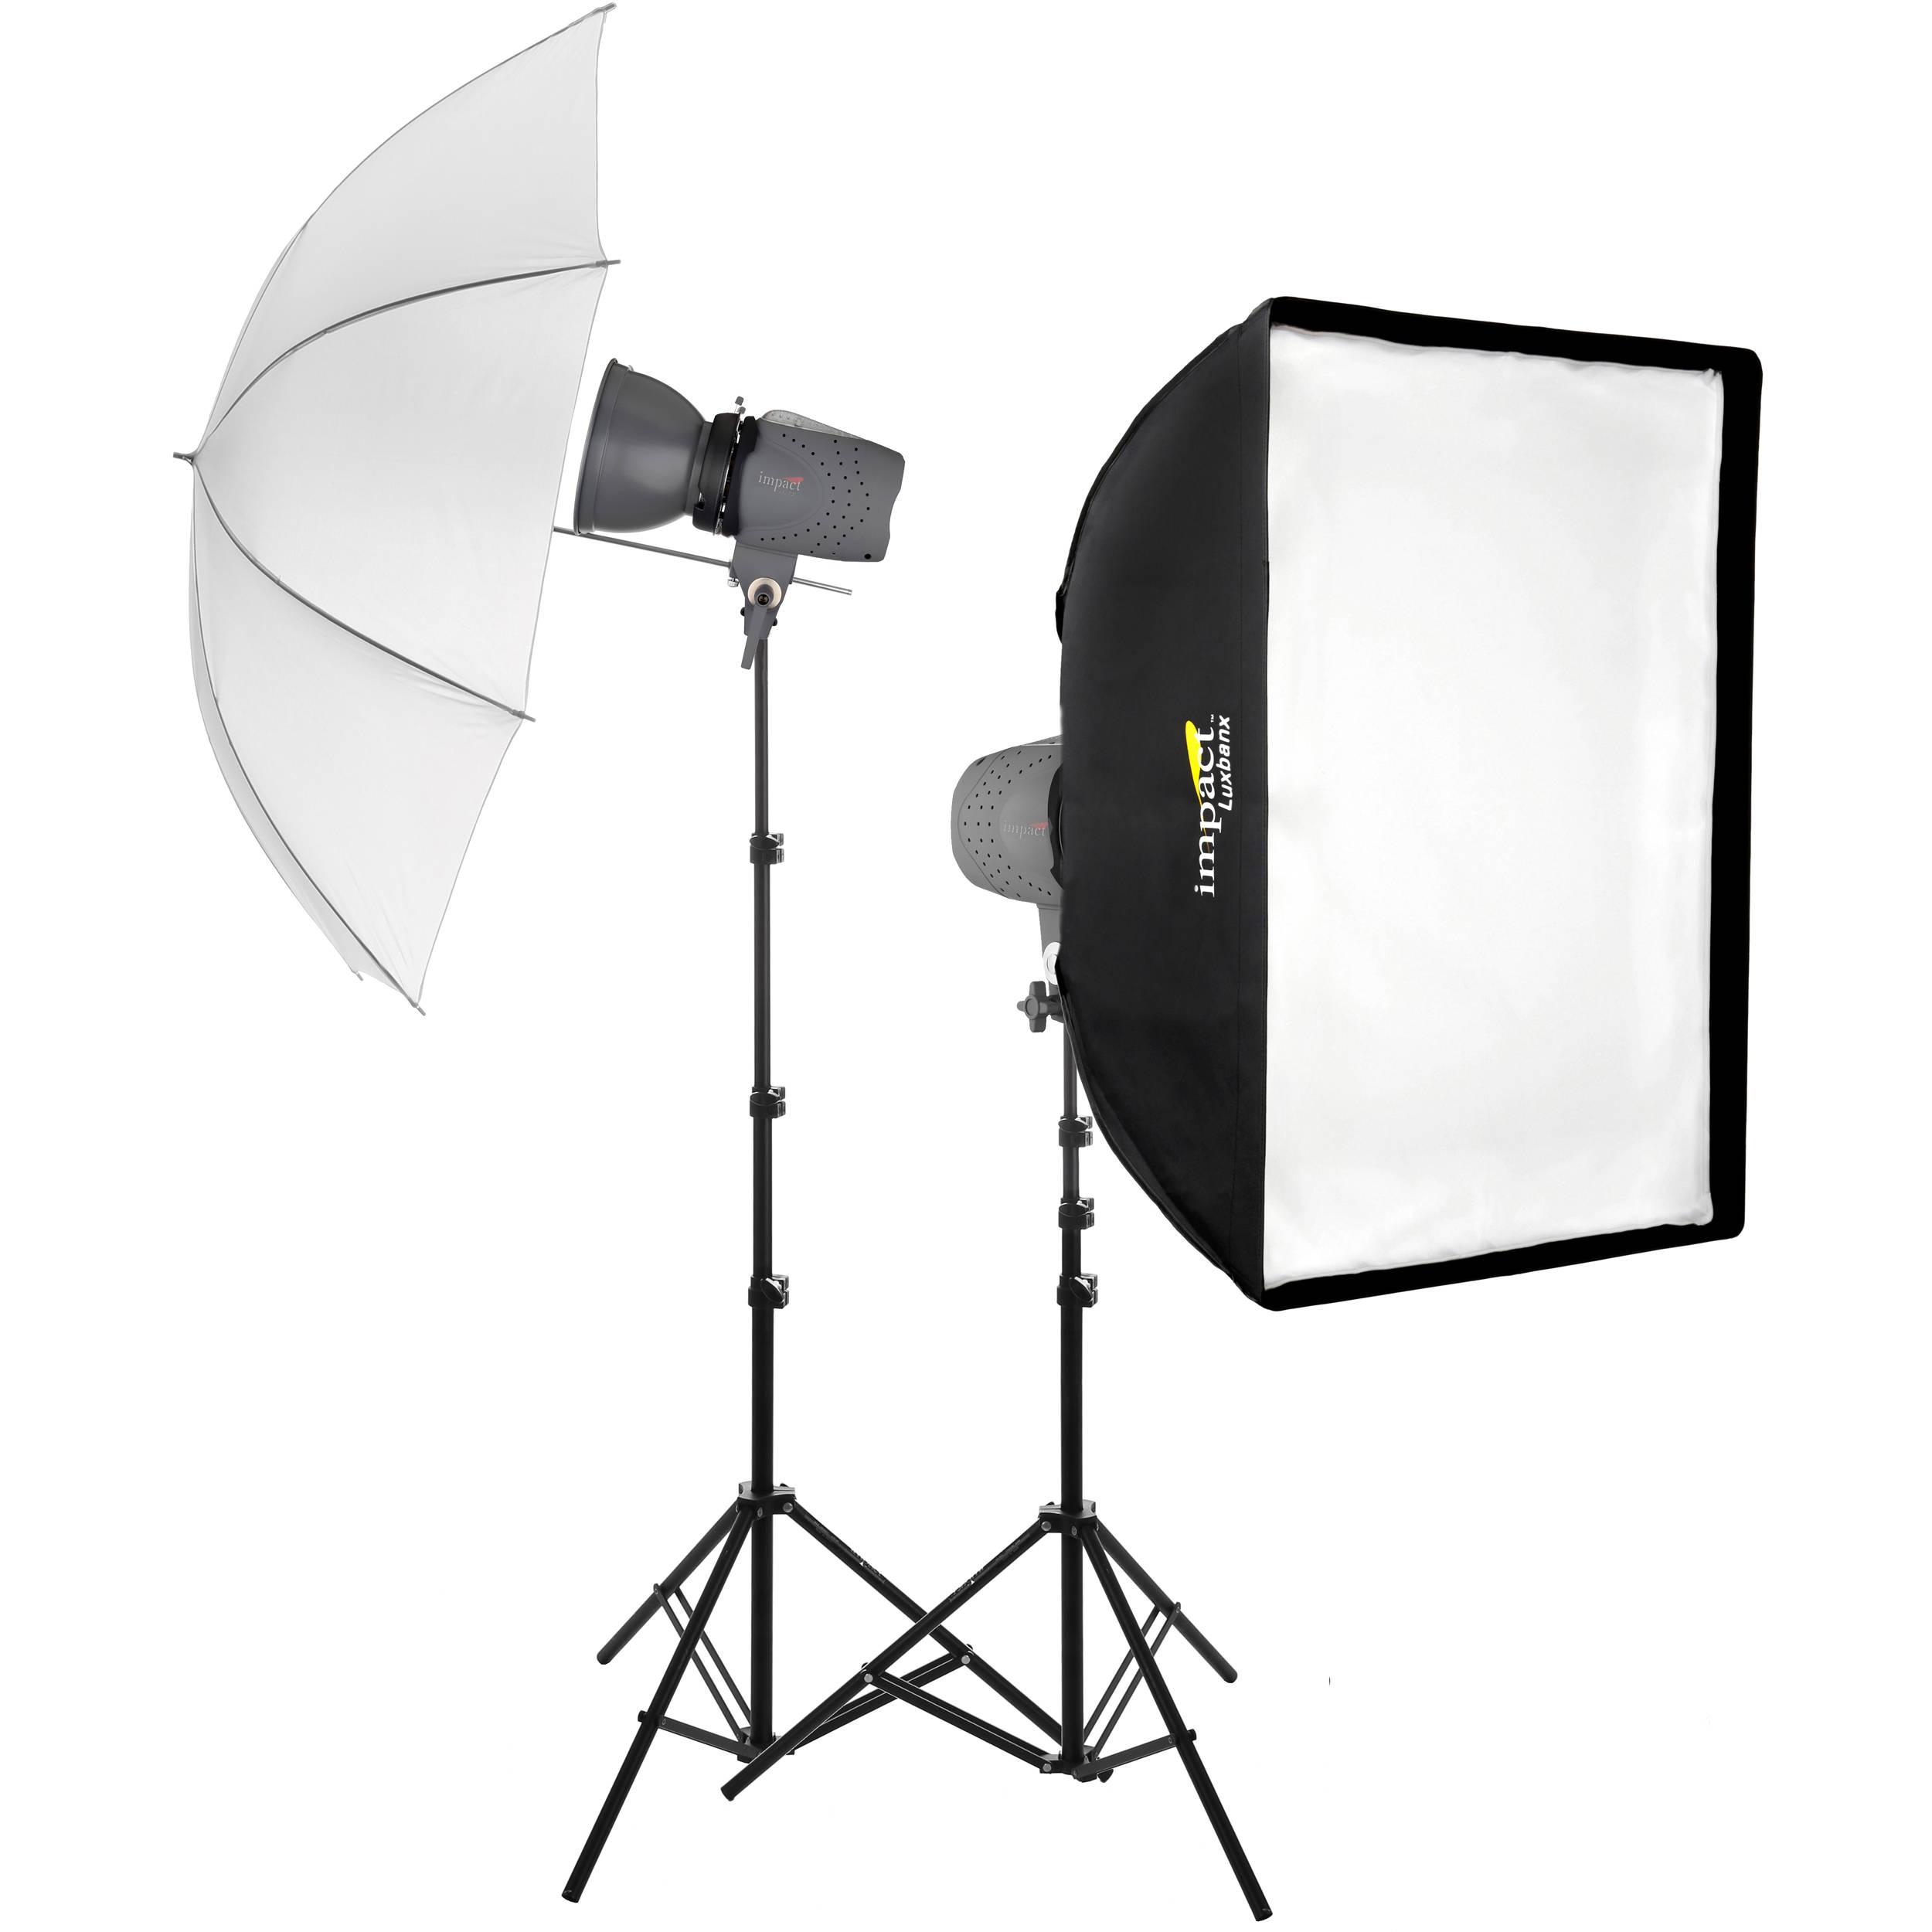 Impact Two Monolight Umbrella Softbox Kit 120 Vac